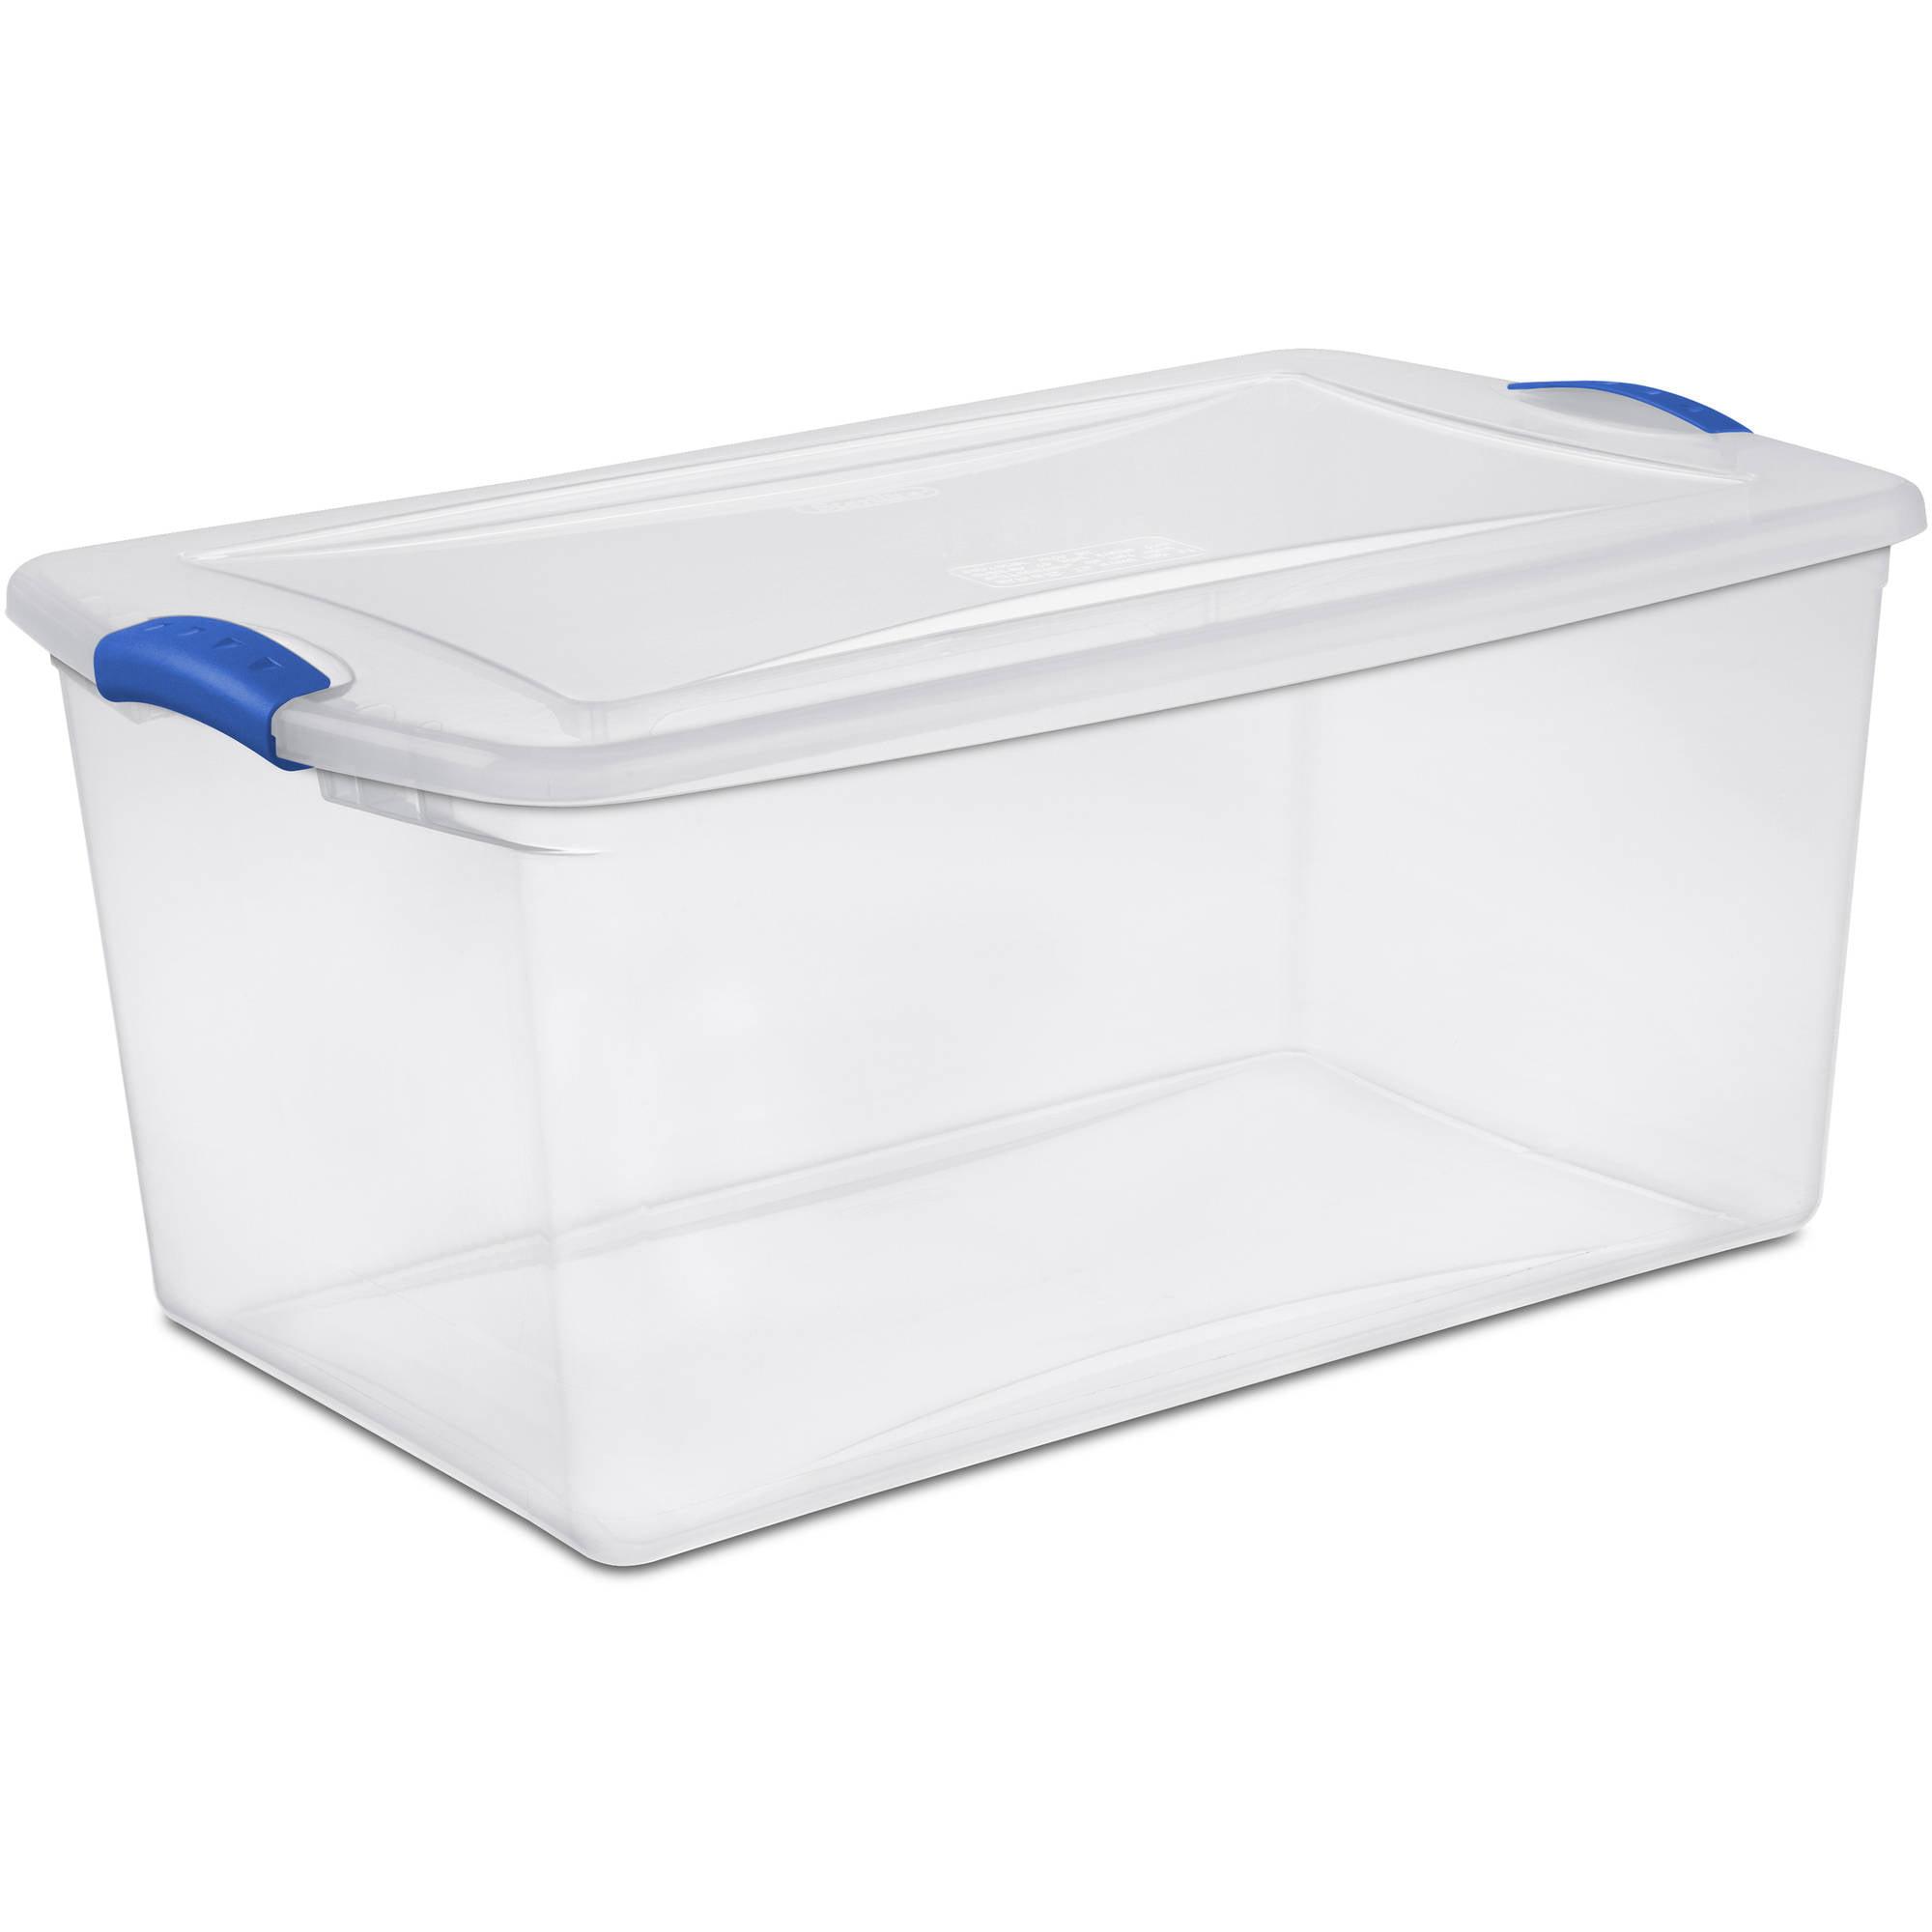 sc 1 st  Walmart & Sterilite 66 Quart Latch Box- Blue Morpho Case of 6 - Walmart.com